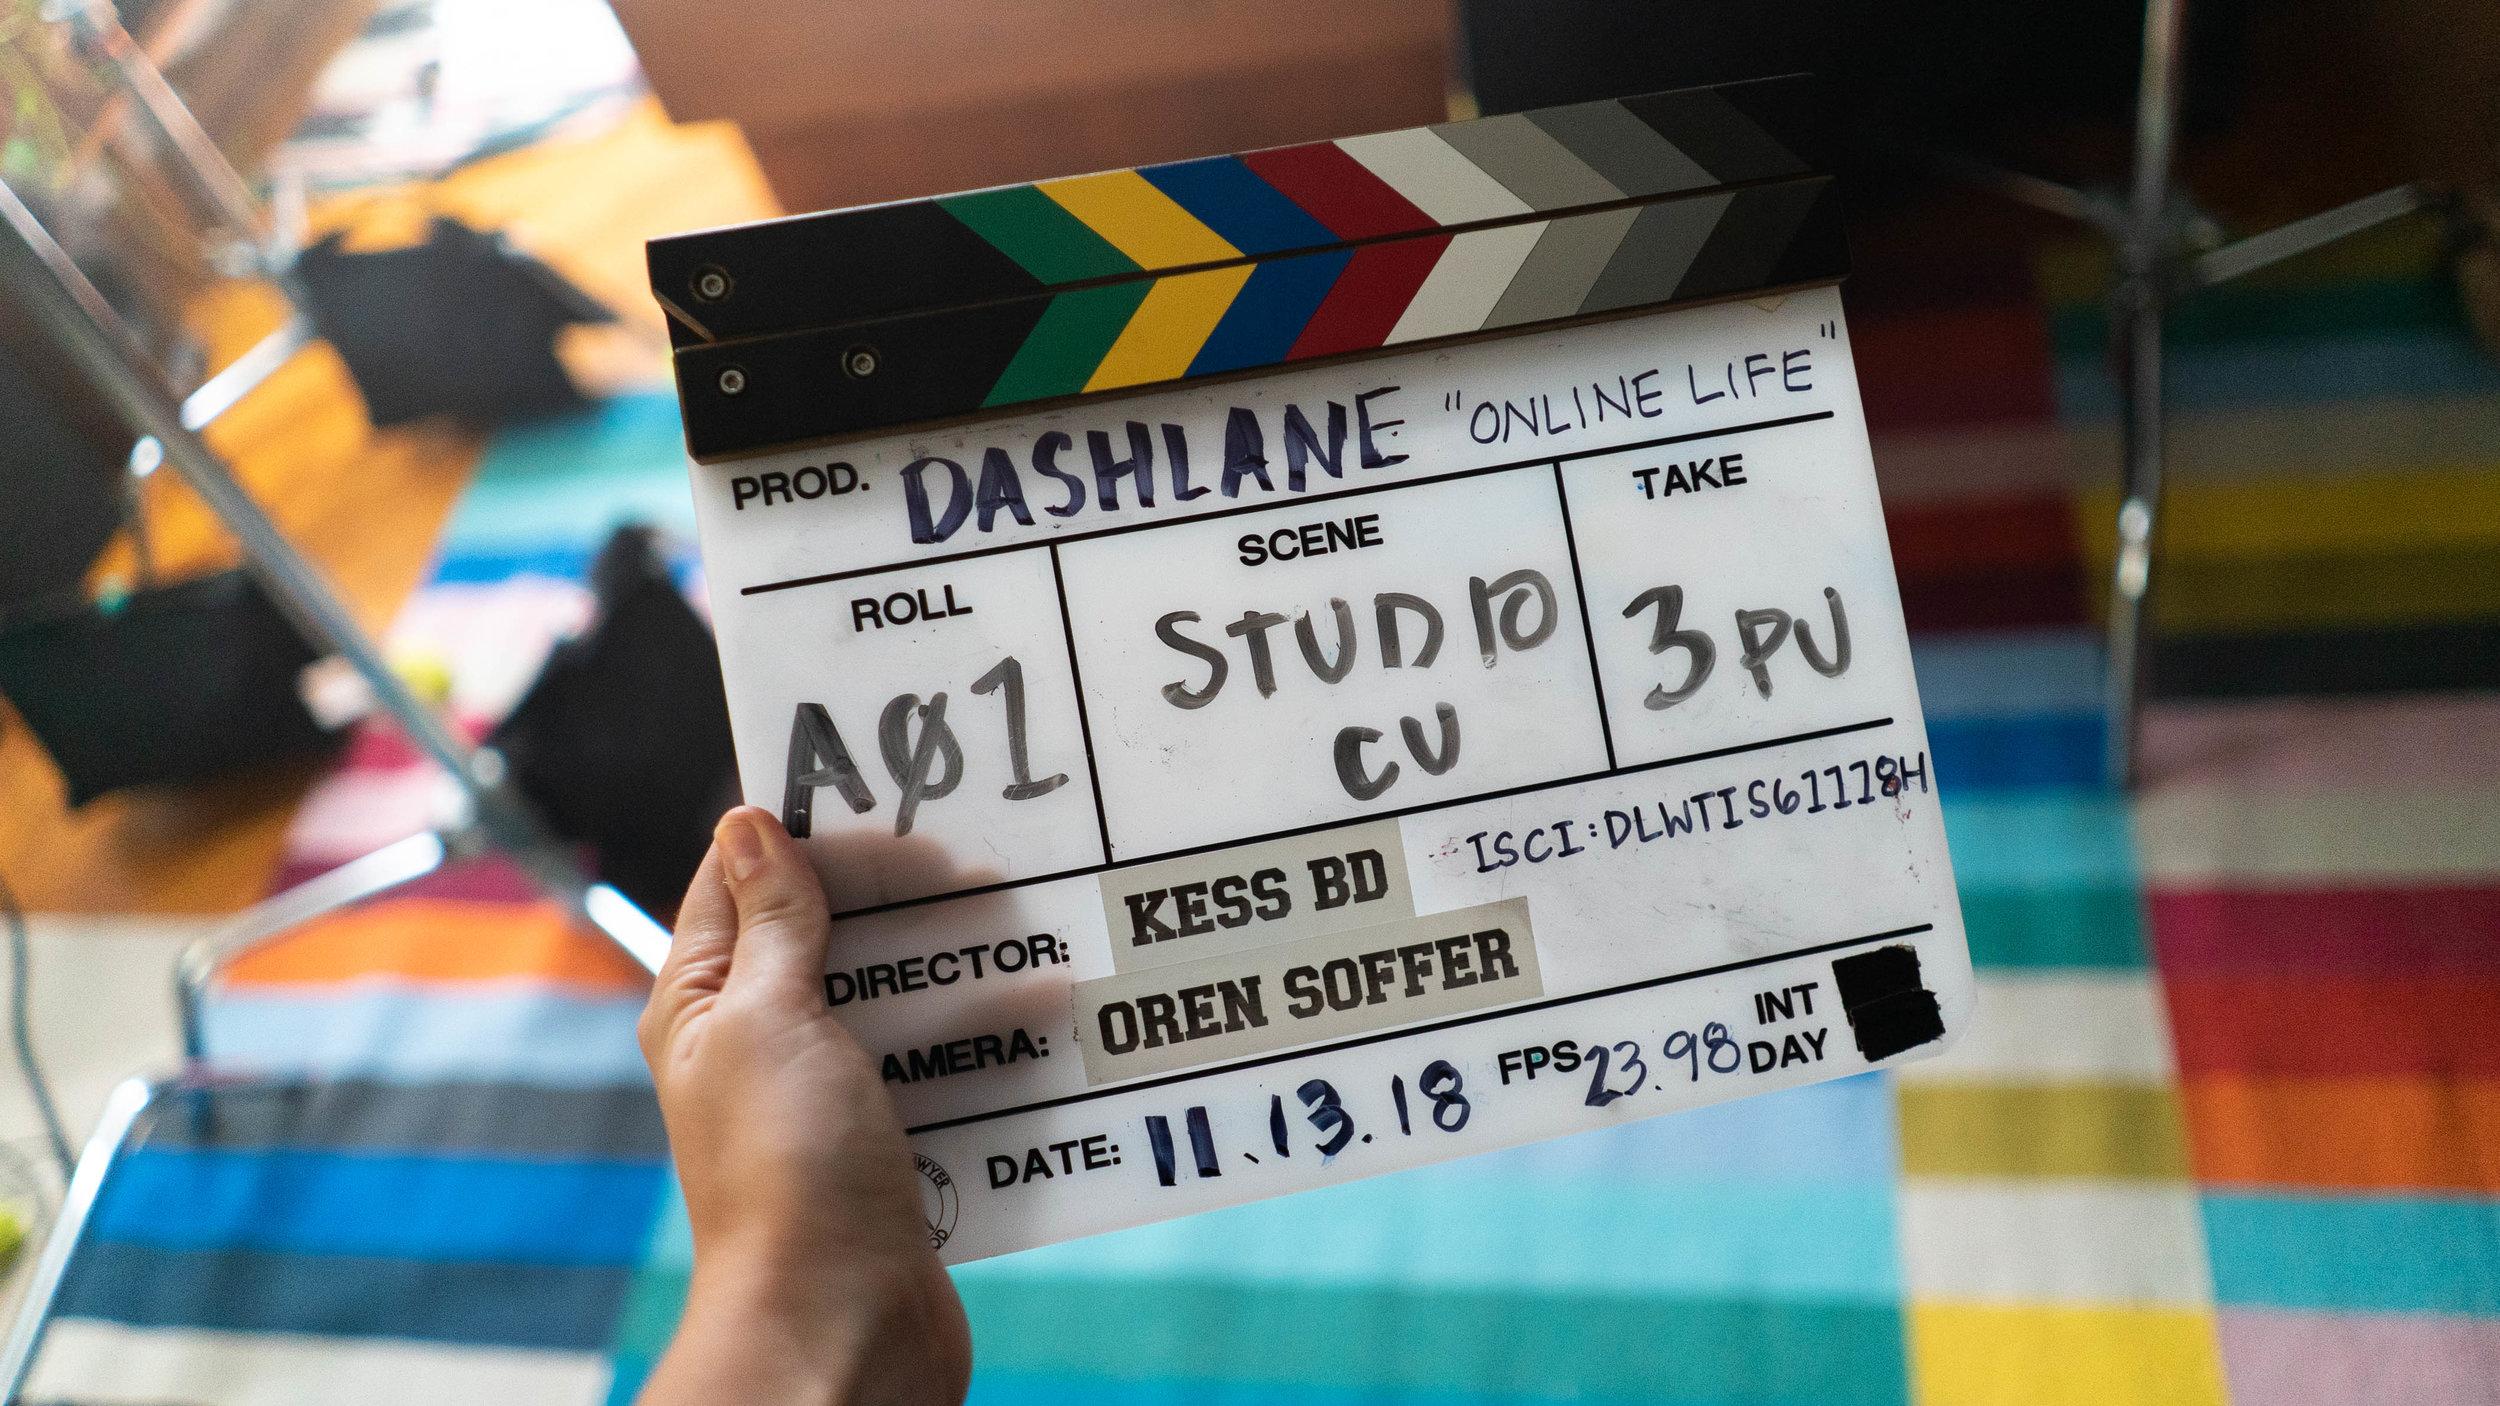 video_production_behind_the_scenes_slate.jpg